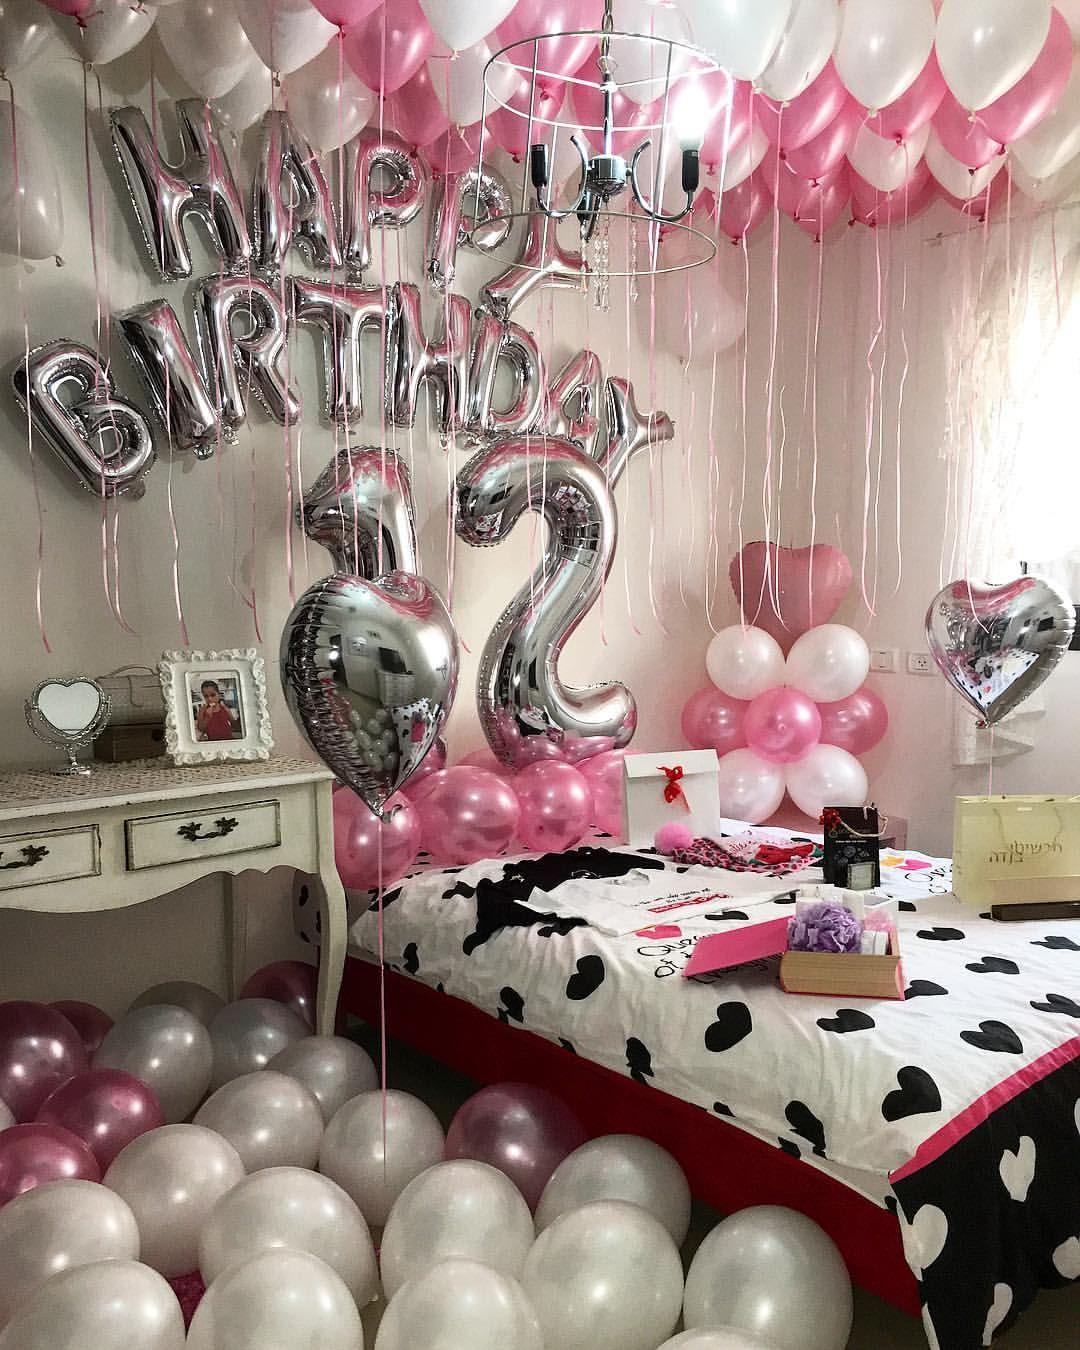 Rey e cumplea os feliz baby shower en 2019 for Cuartos decorados para aniversario